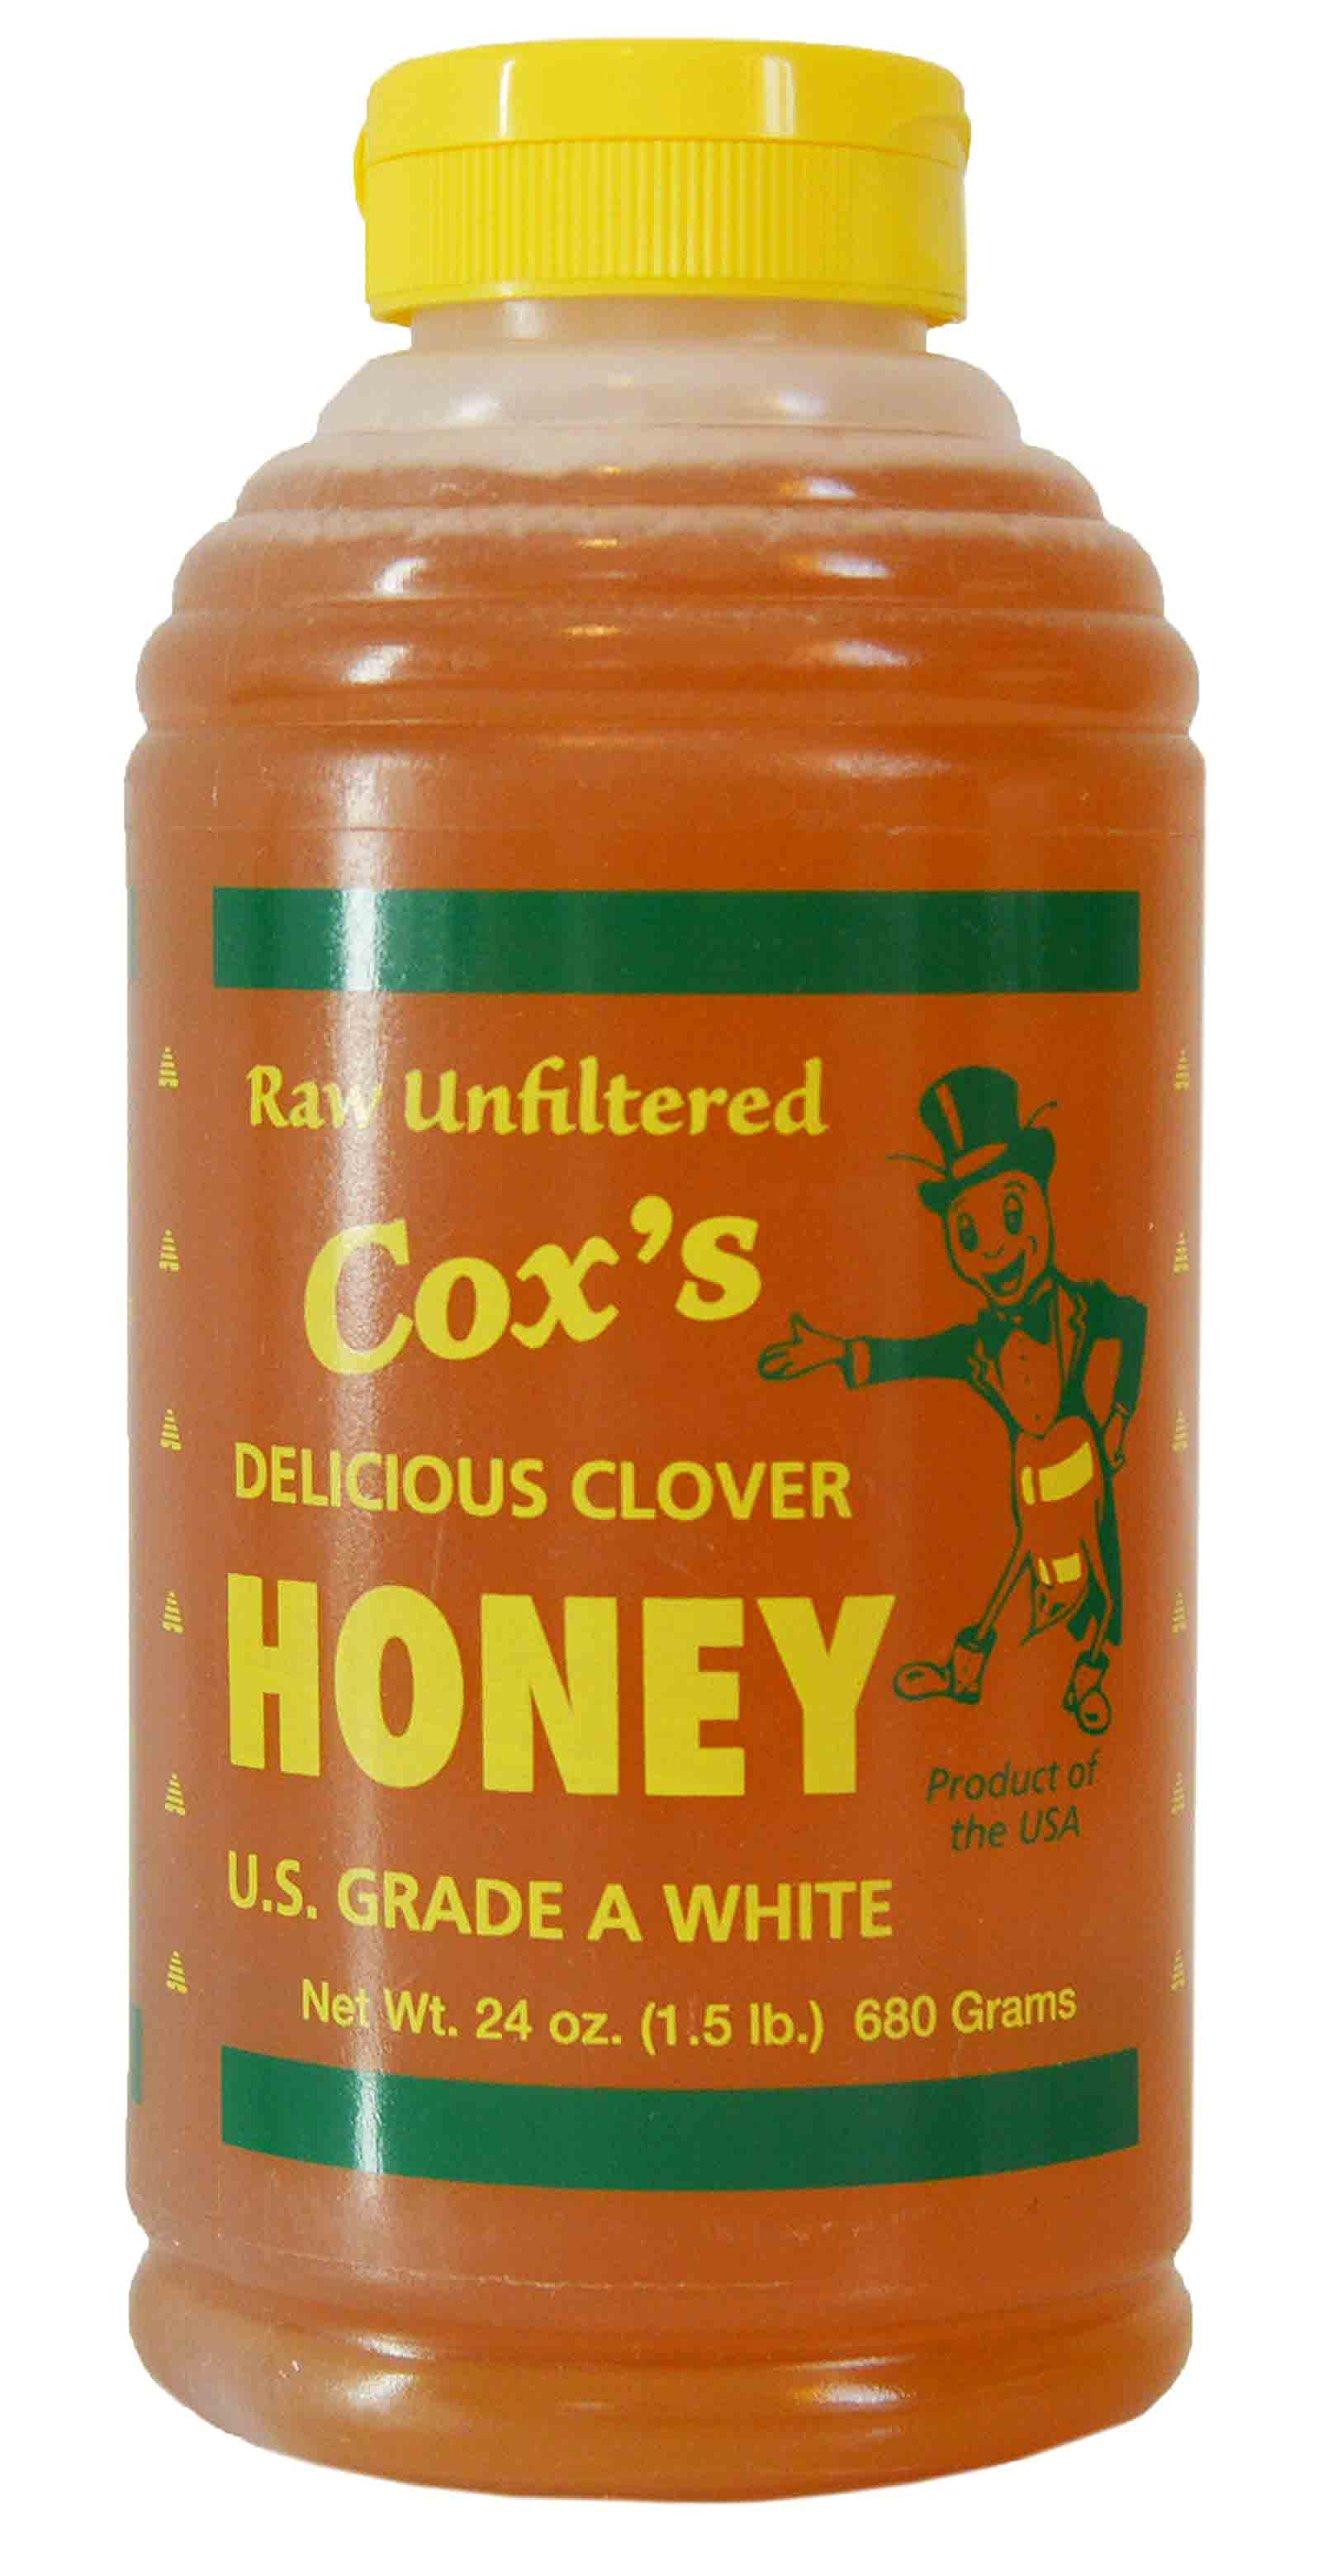 Cox's Raw Honey - Unfiltered Liquid Honey | 100% Pure Clover Delicious Honey, 24 oz